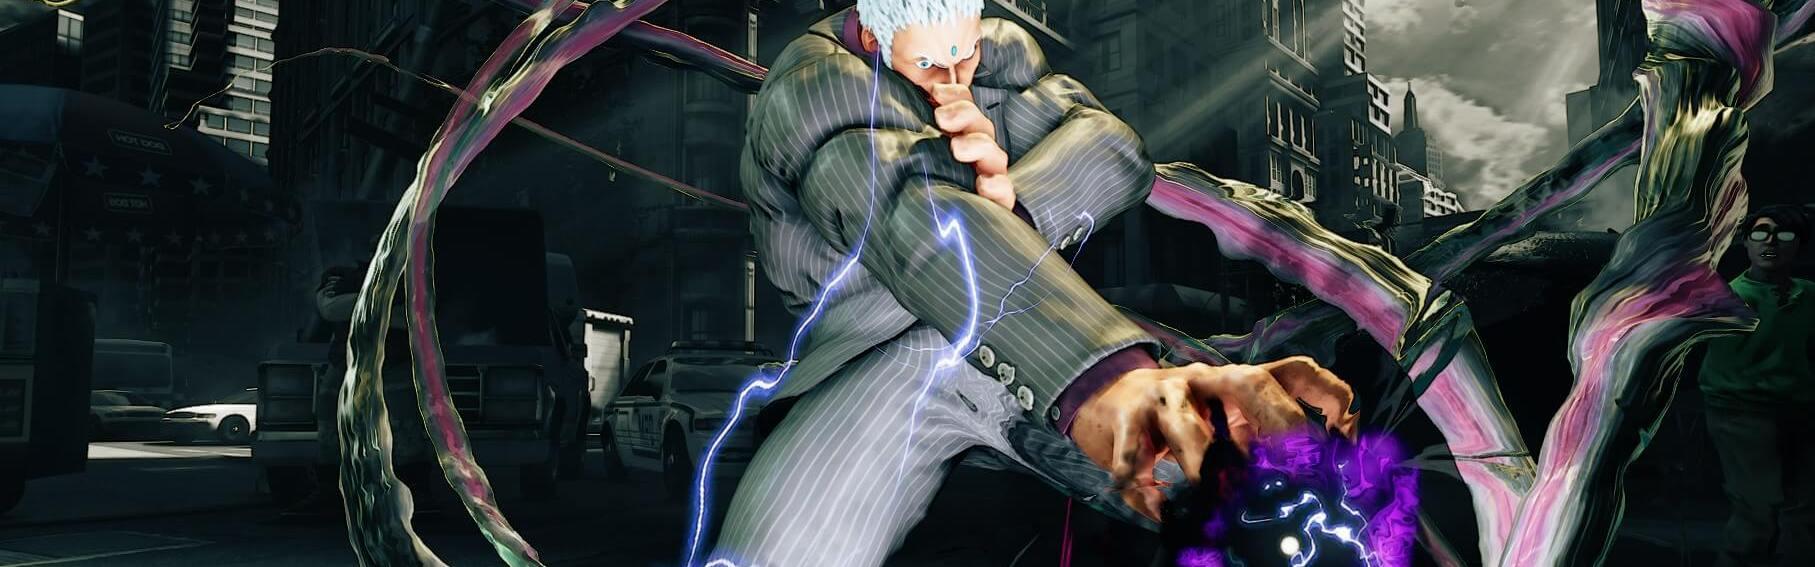 Street Fighter V - Season 1 Character Pass (DLC) Steam Key GLOBAL